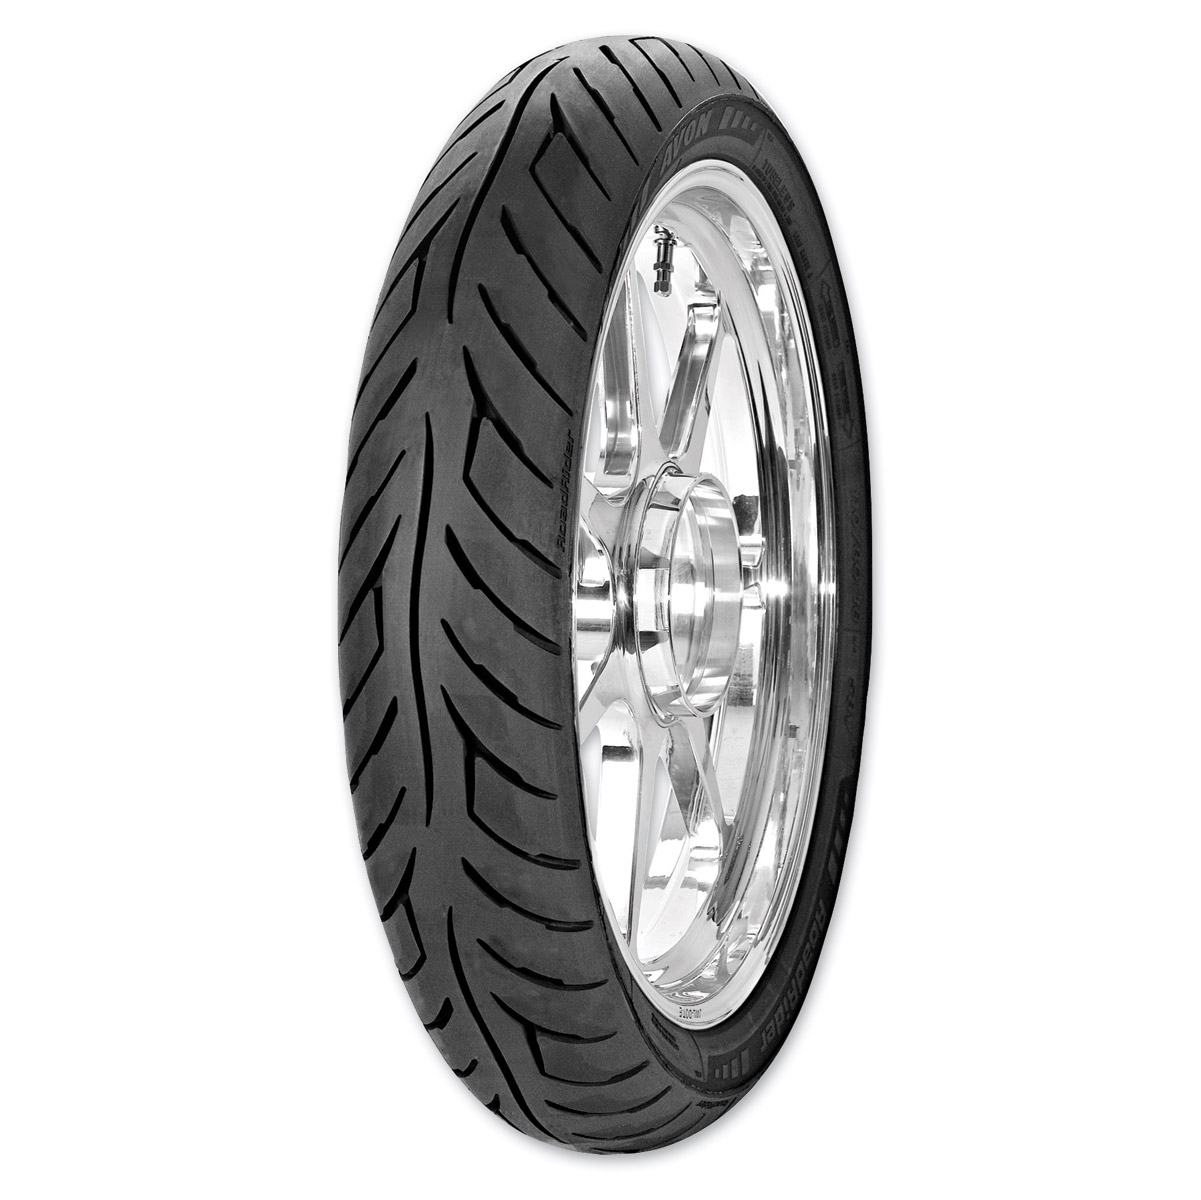 Avon AM26 Roadrider 120/90-17 Front/Rear Tire